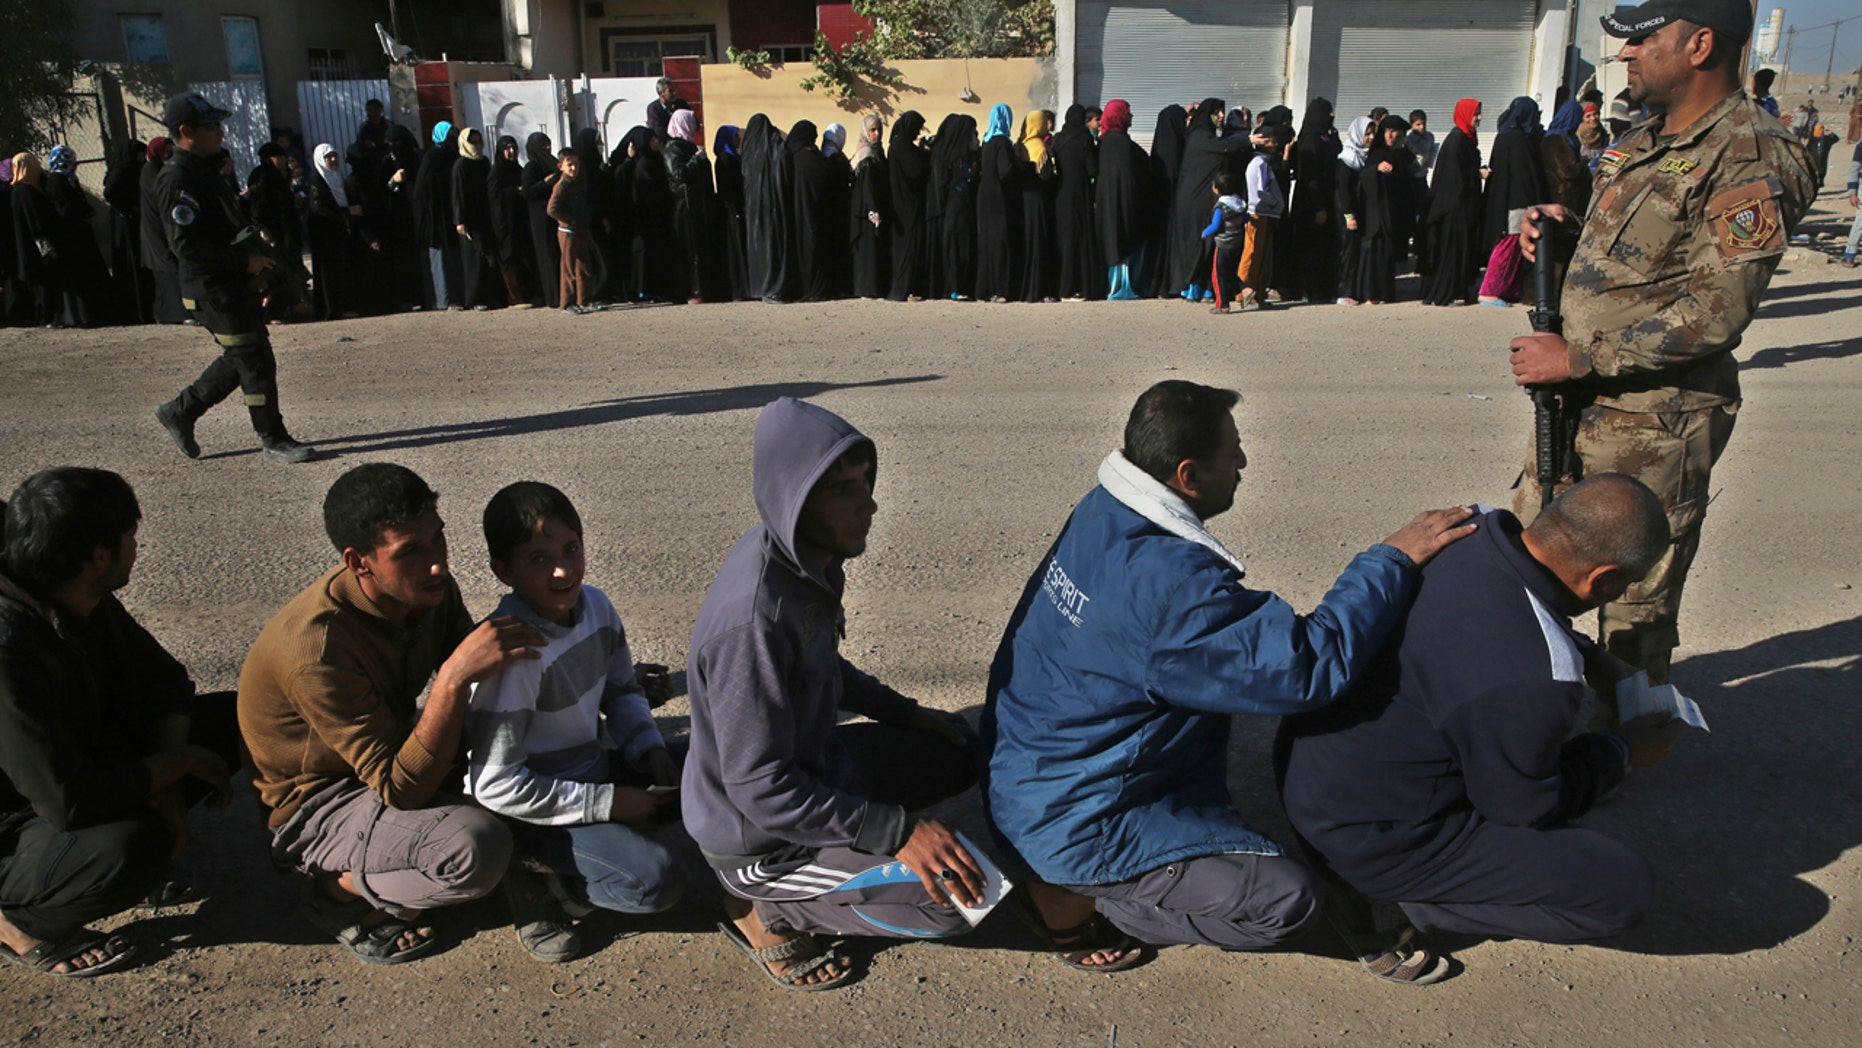 Iraqi citizens que to receive food supplies, at al-Arbajiyeh neighborhood, in Mosul, Iraq, Saturday, Nov. 19, 2016.